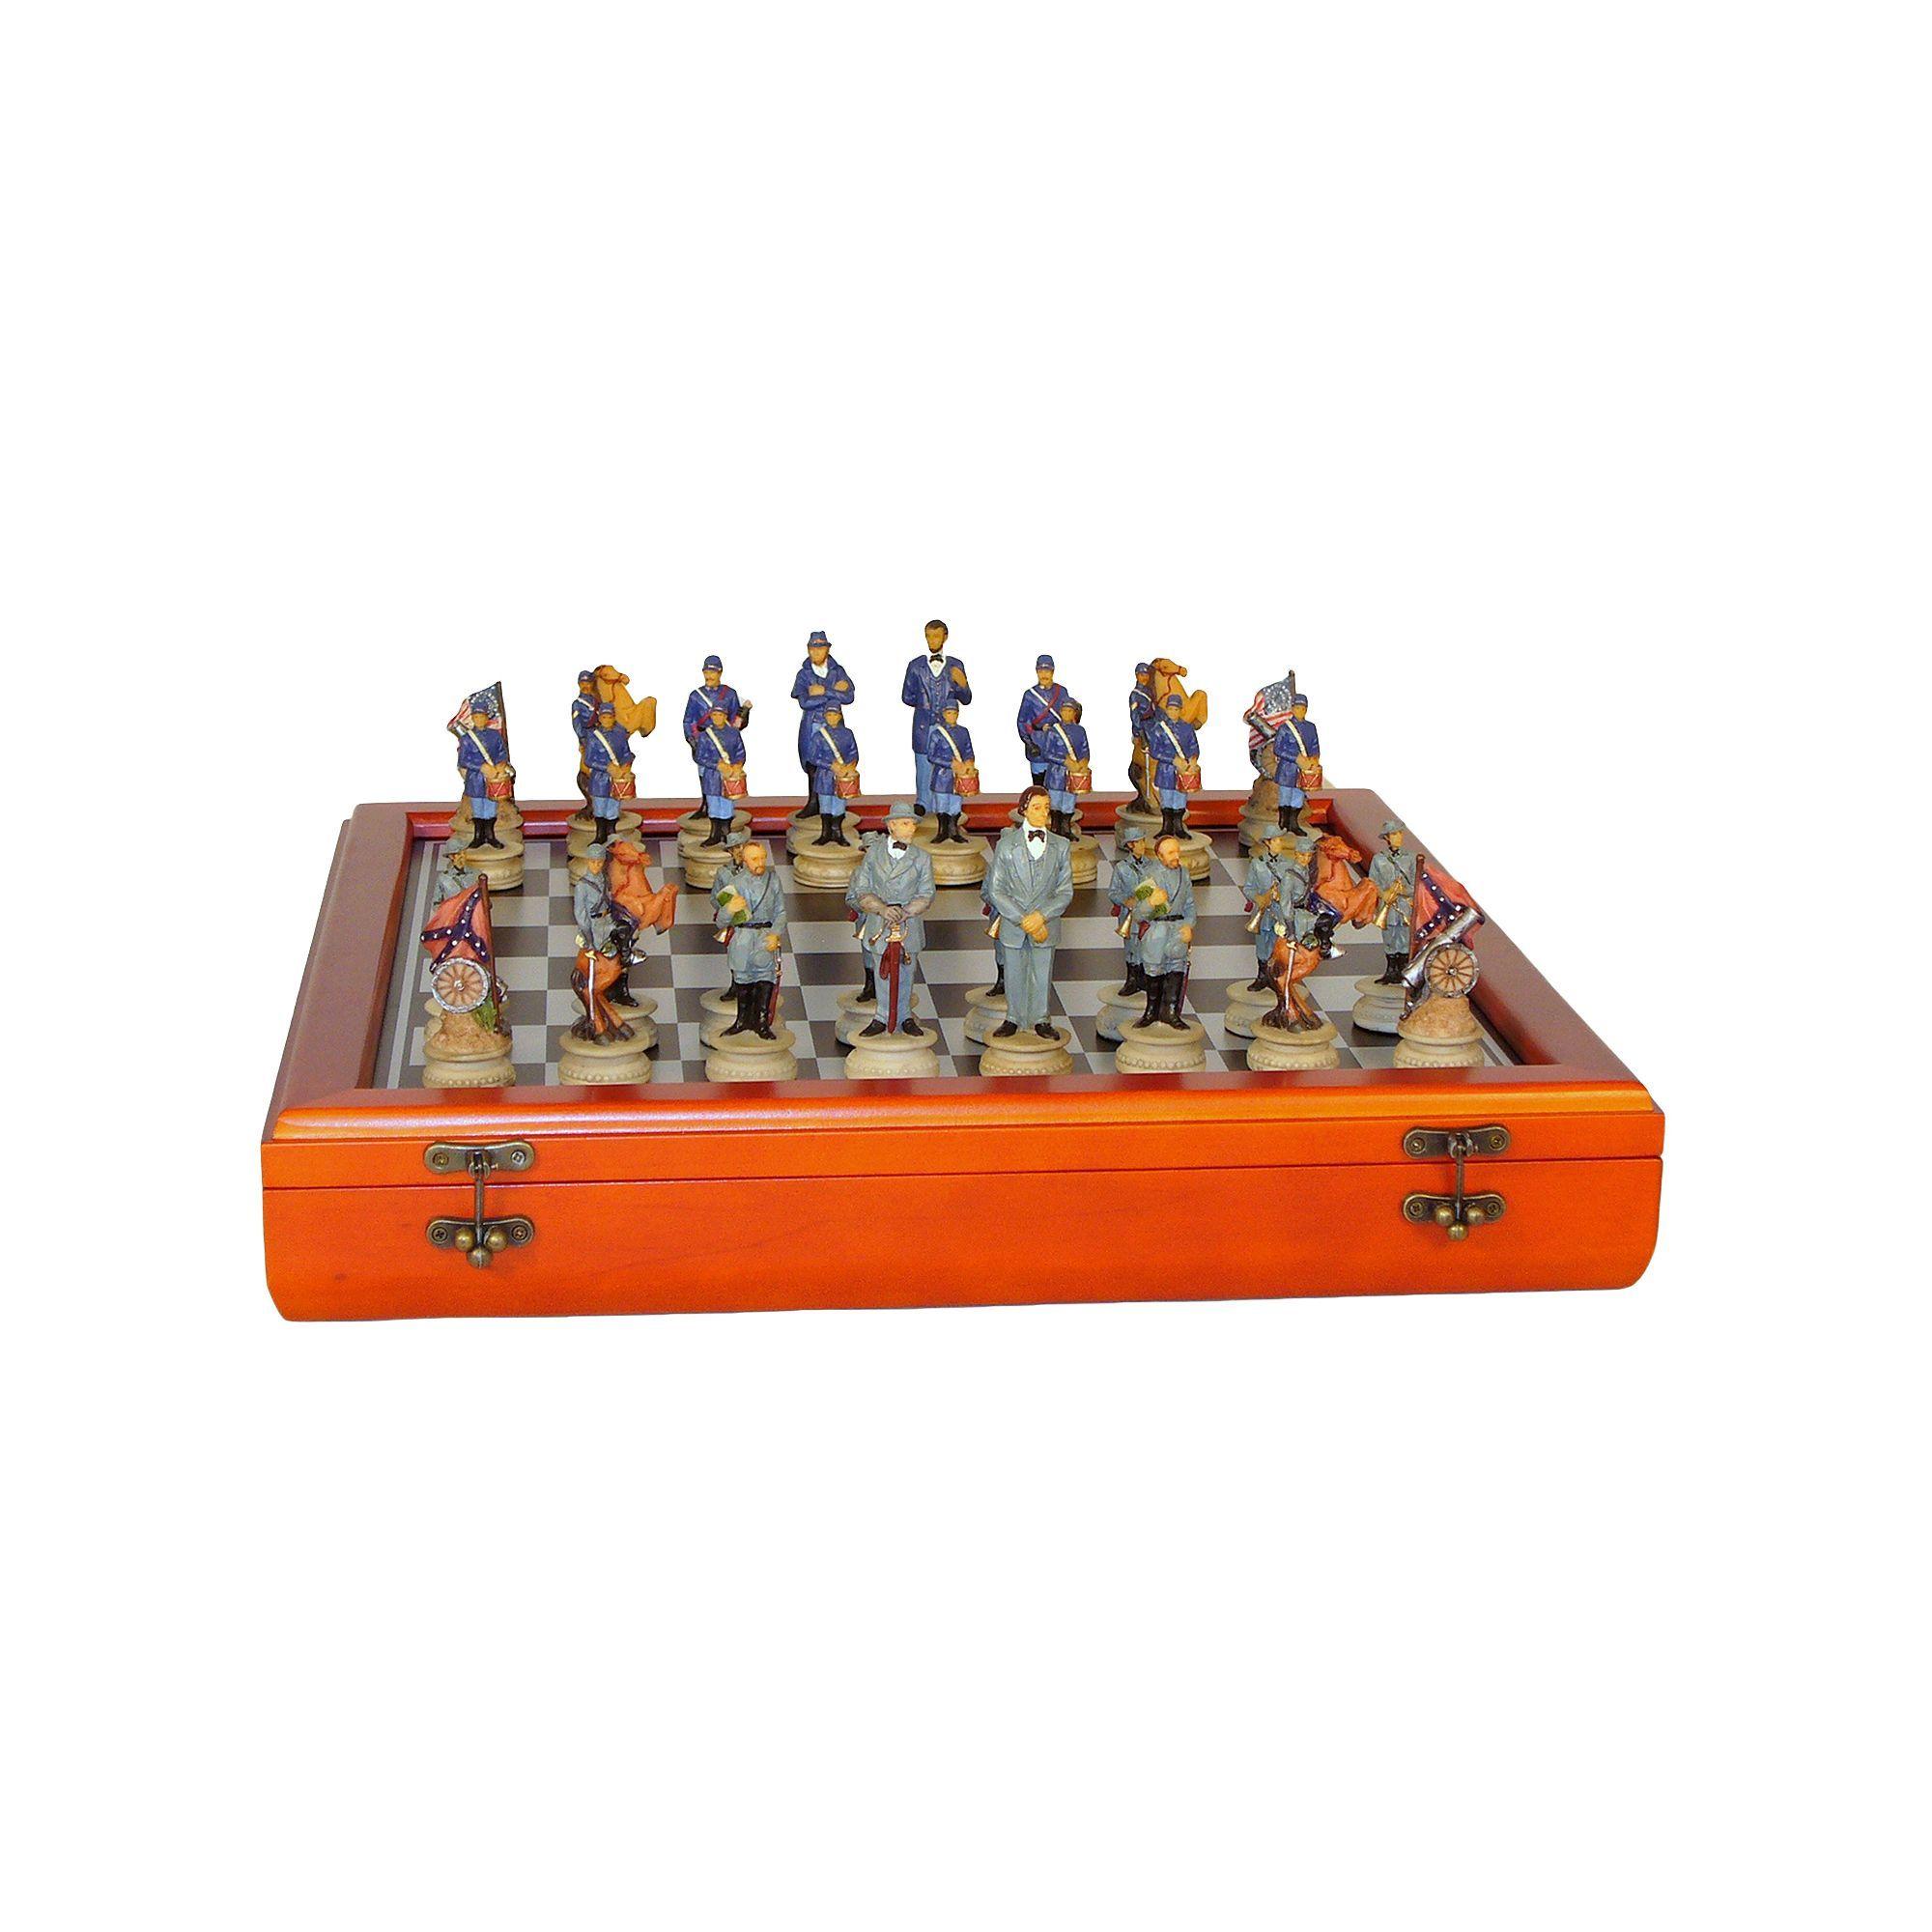 WorldWise Imports Civil War Generals Chess Set & Cherry